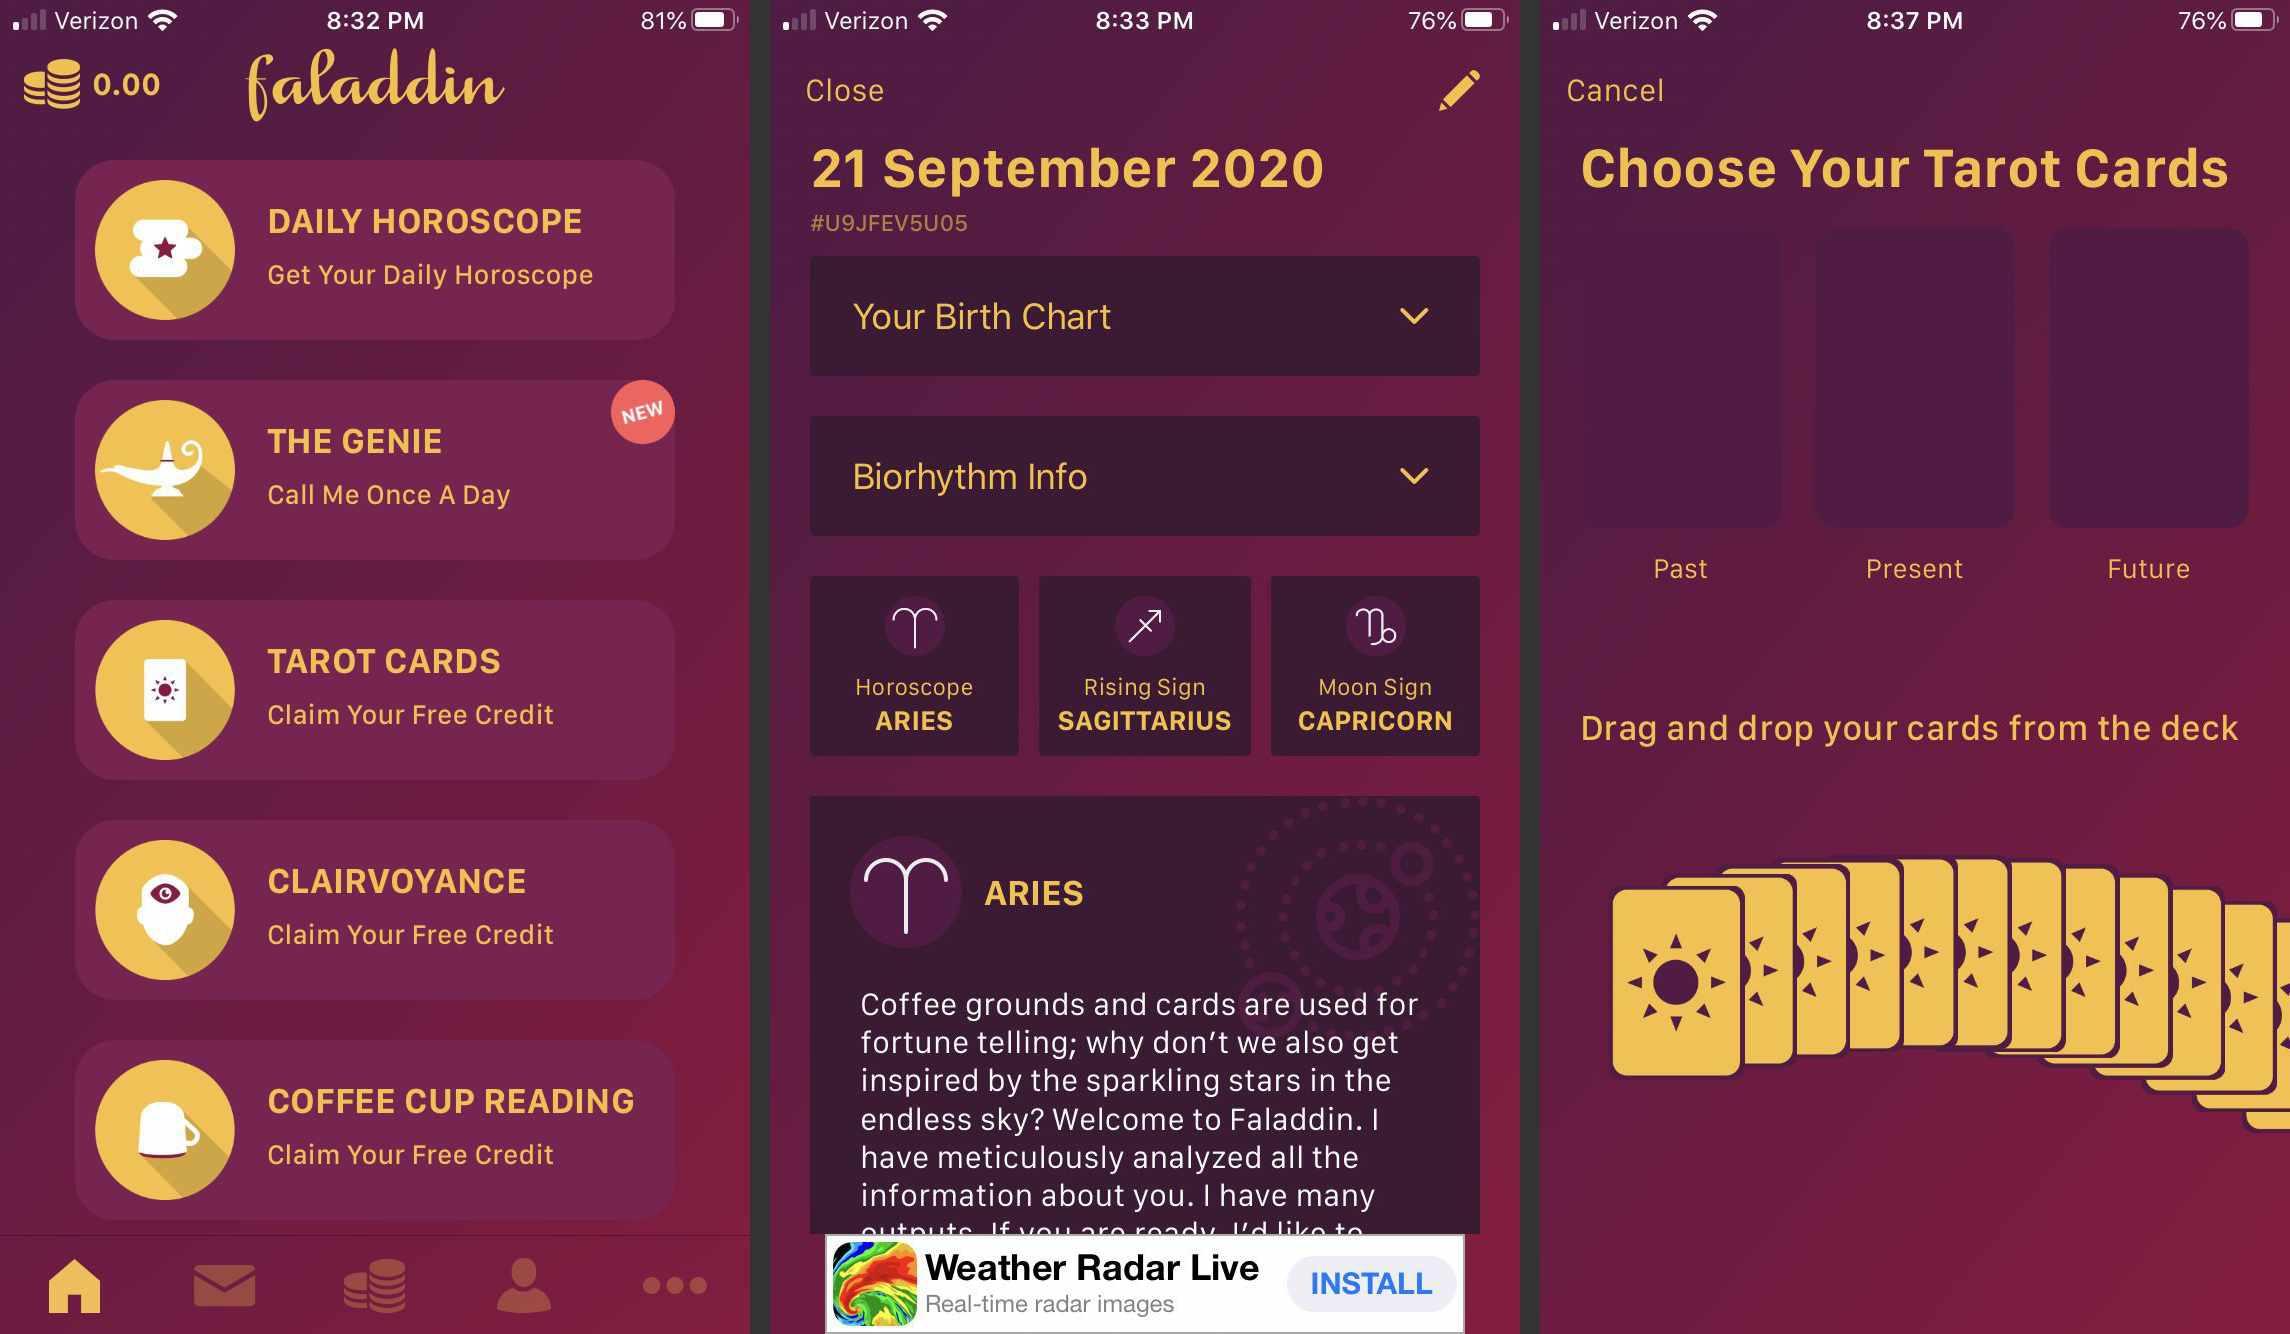 Screenshots of the Faladdin app.